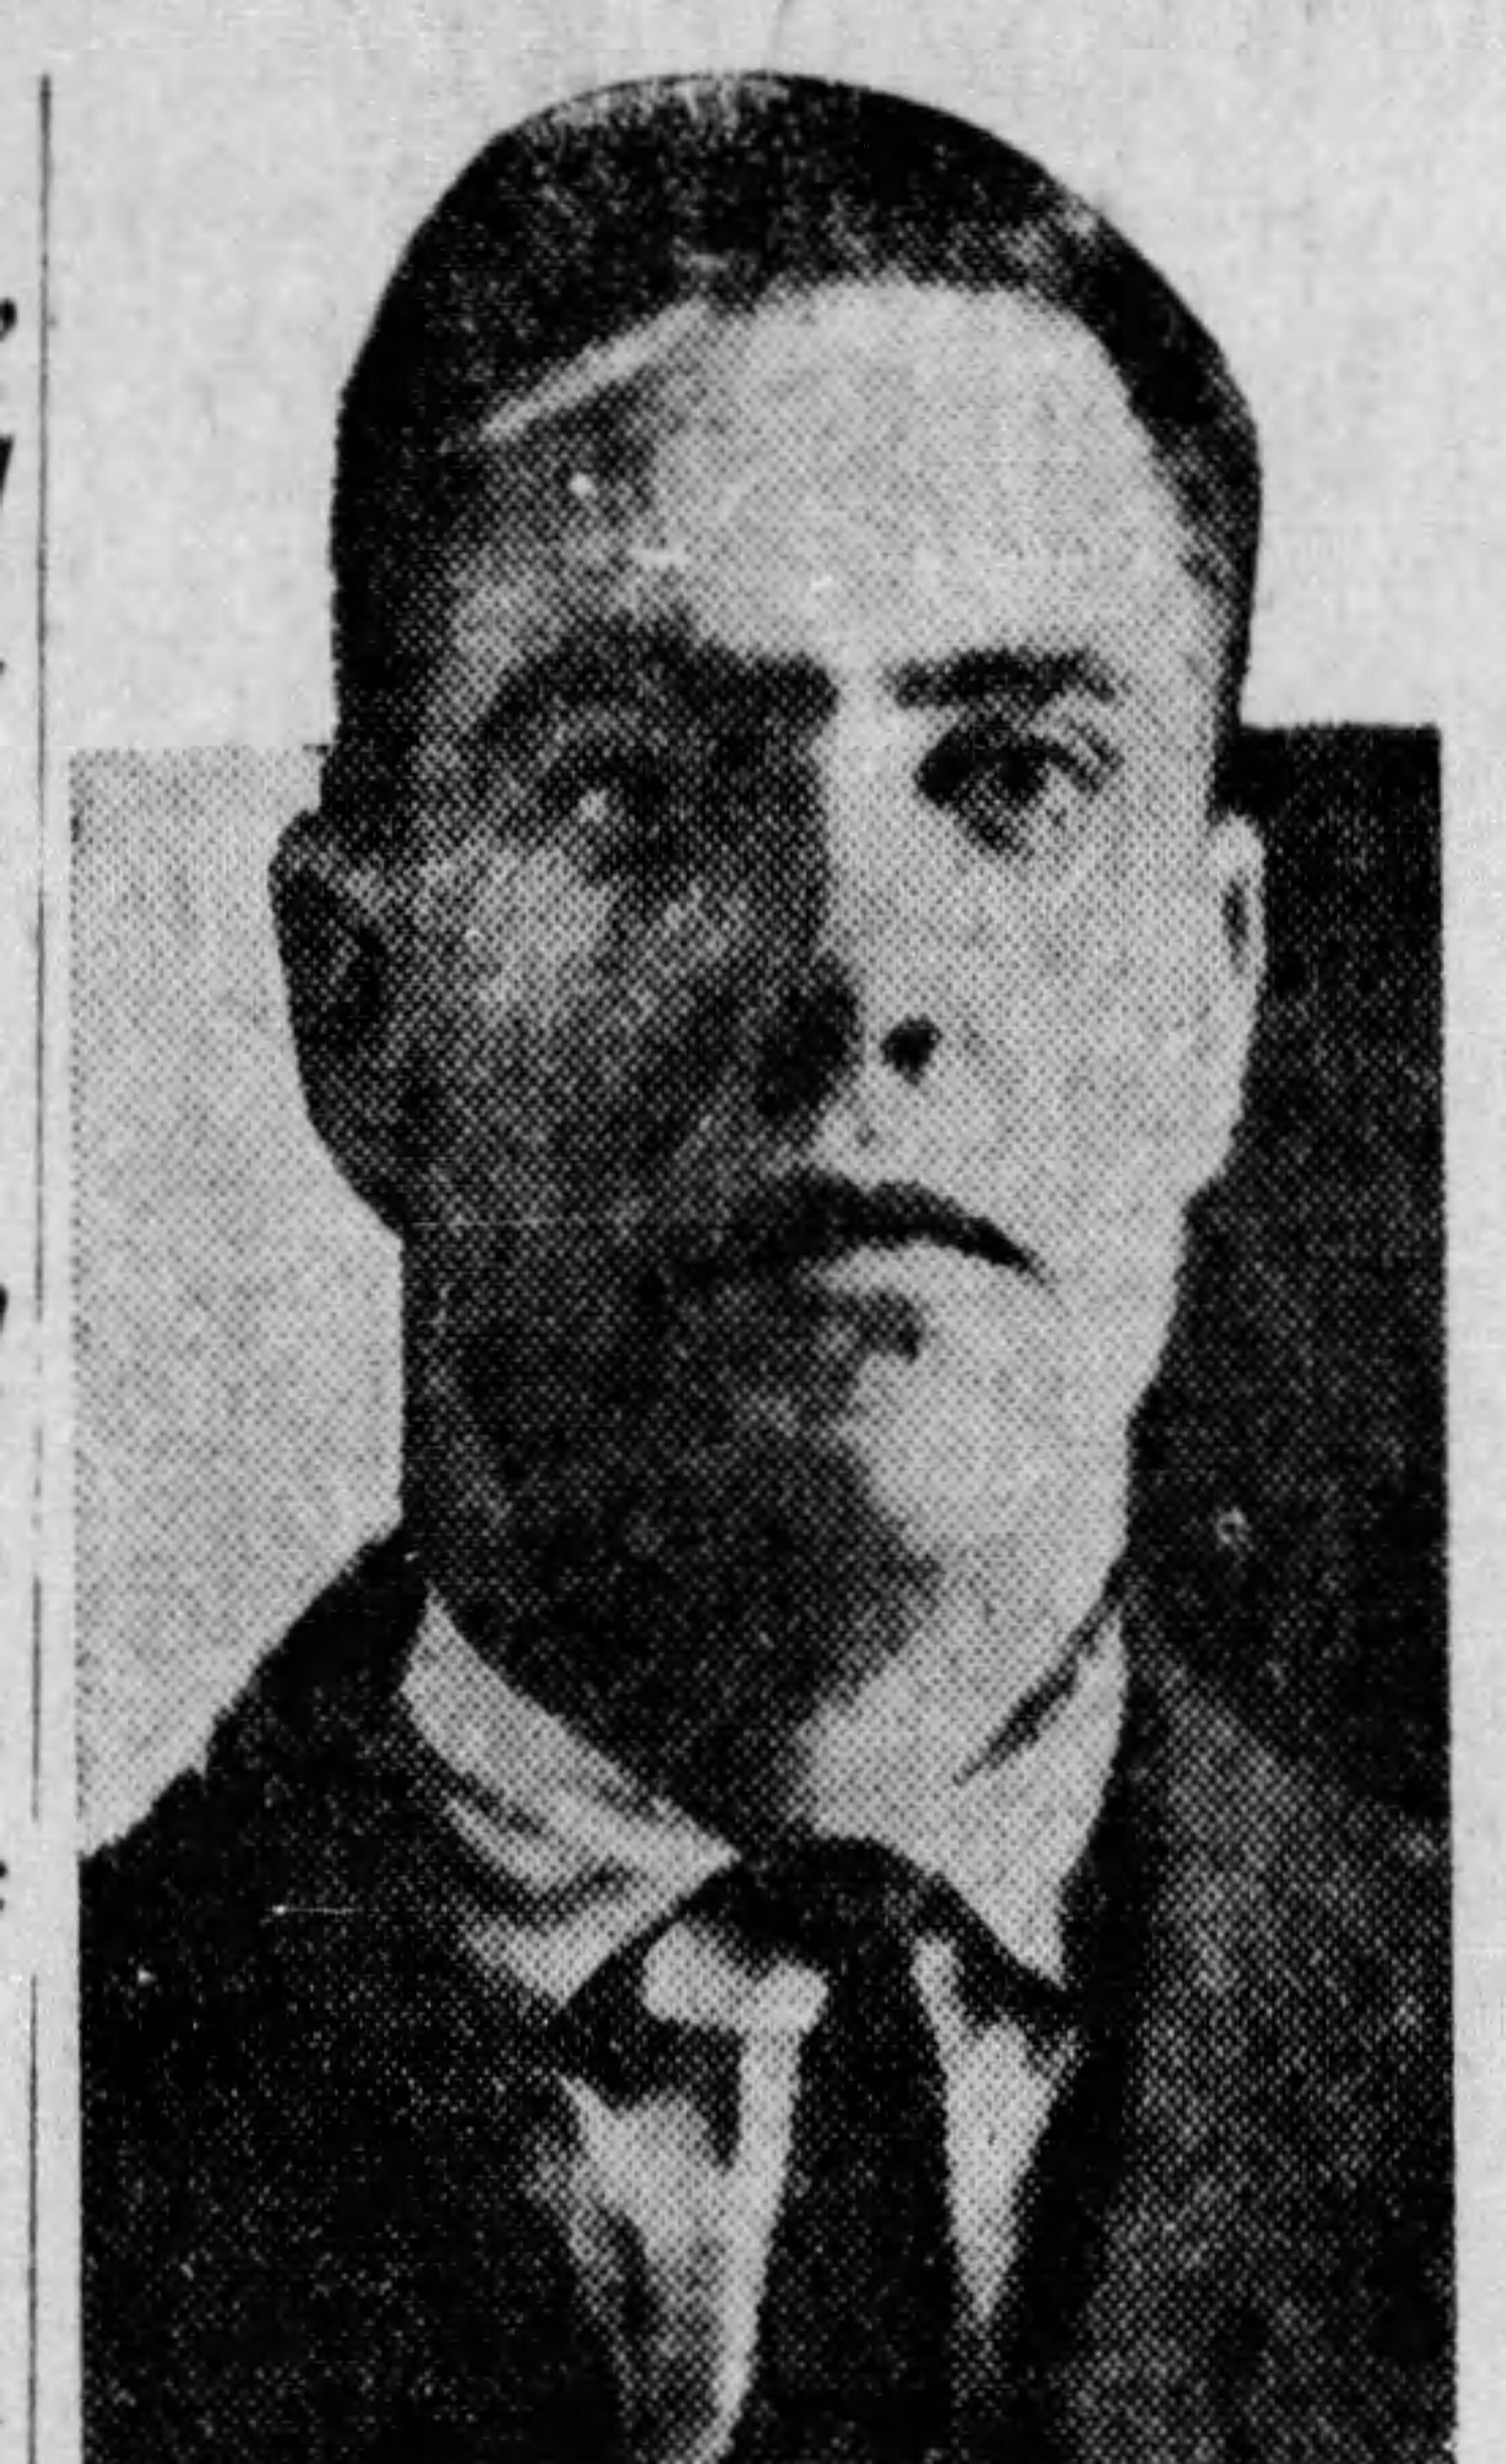 Policeman Robert A. McGarvey | Philadelphia Police Department, Pennsylvania